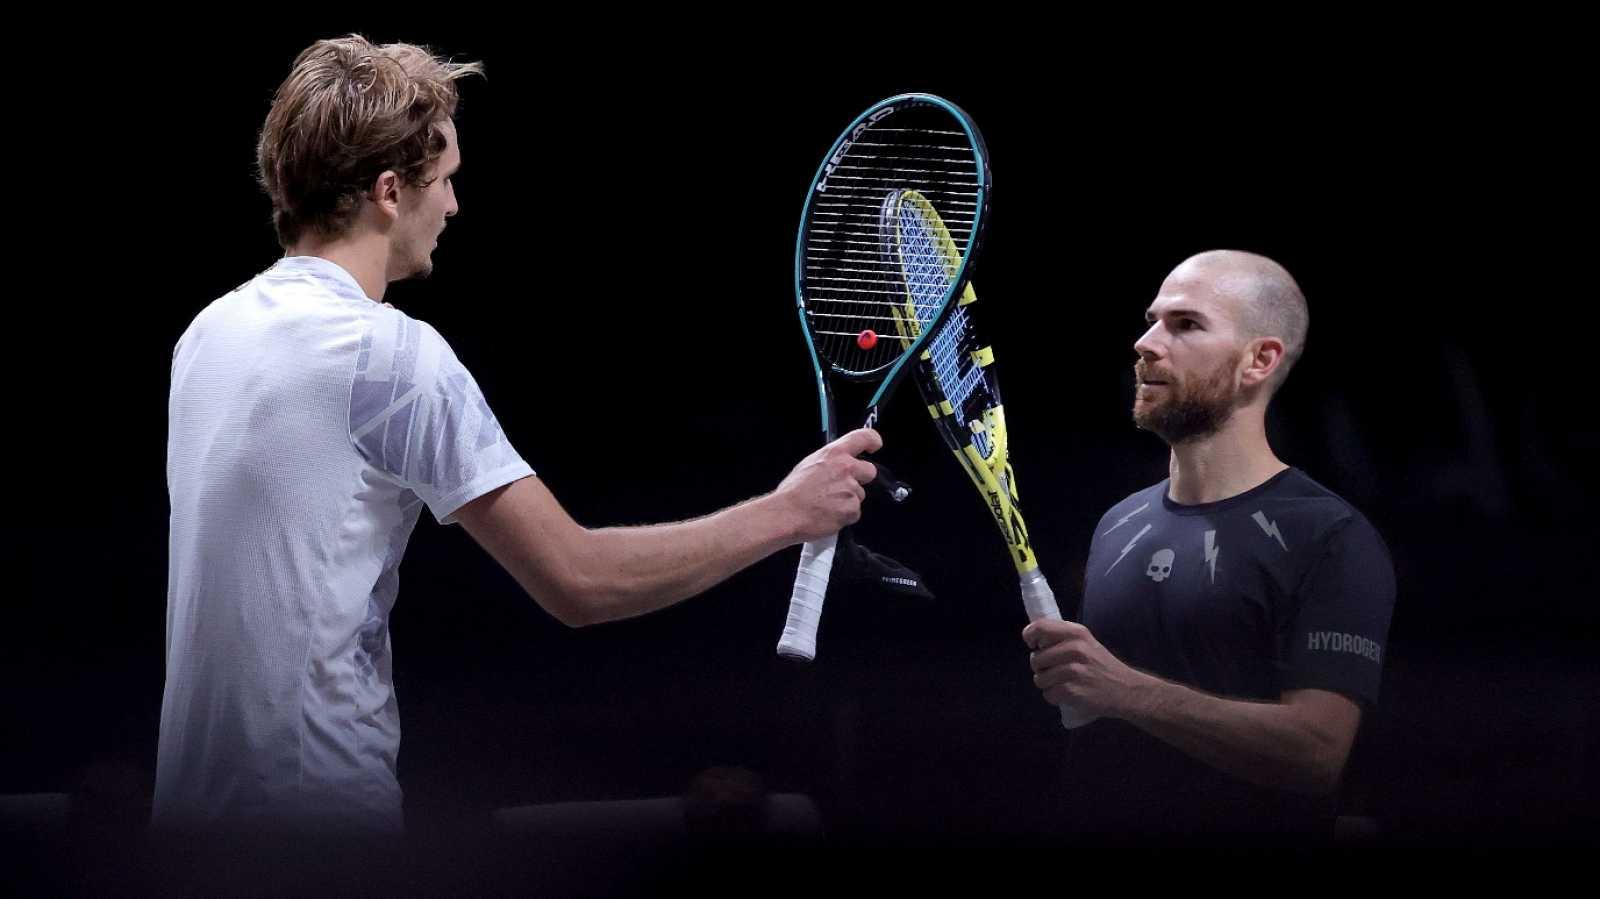 Tenis - ATP 250 Torneo Colonia (II). 1/4 final: Alexander Zverev - Adrian Mannarino - ver ahora